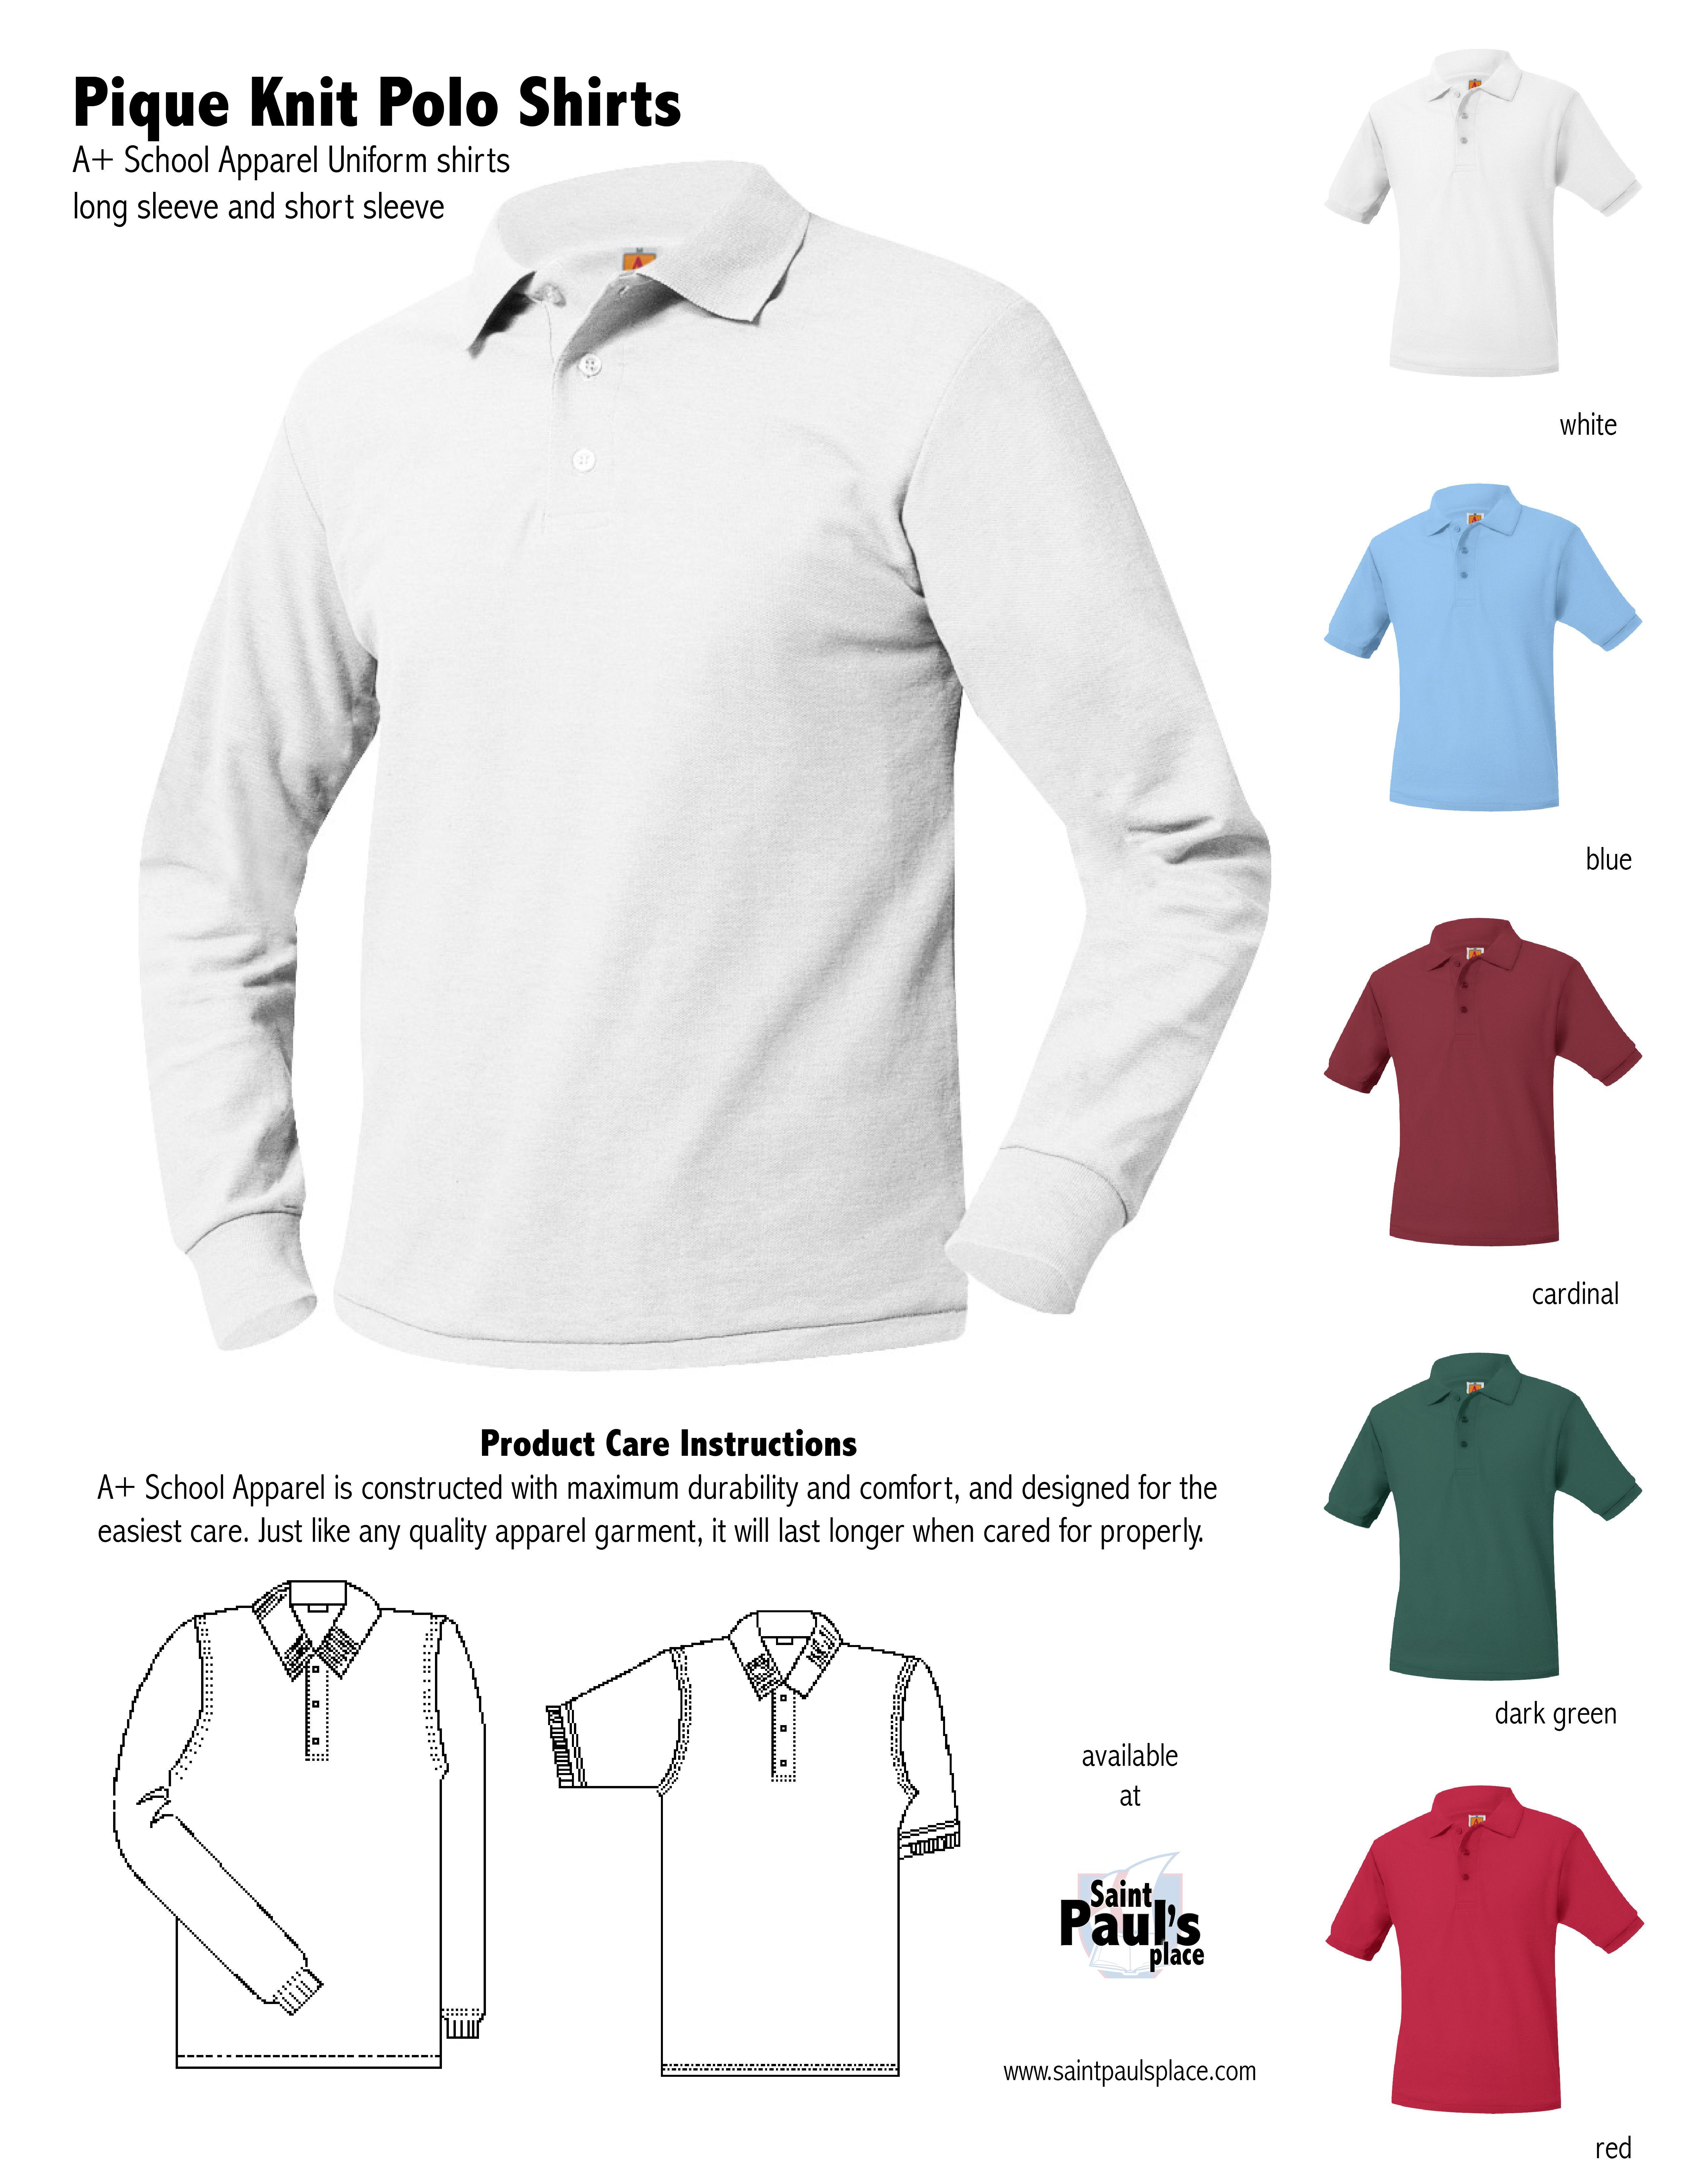 A School Apparel Pique Knit Polo Uniform Shirts Uniform And